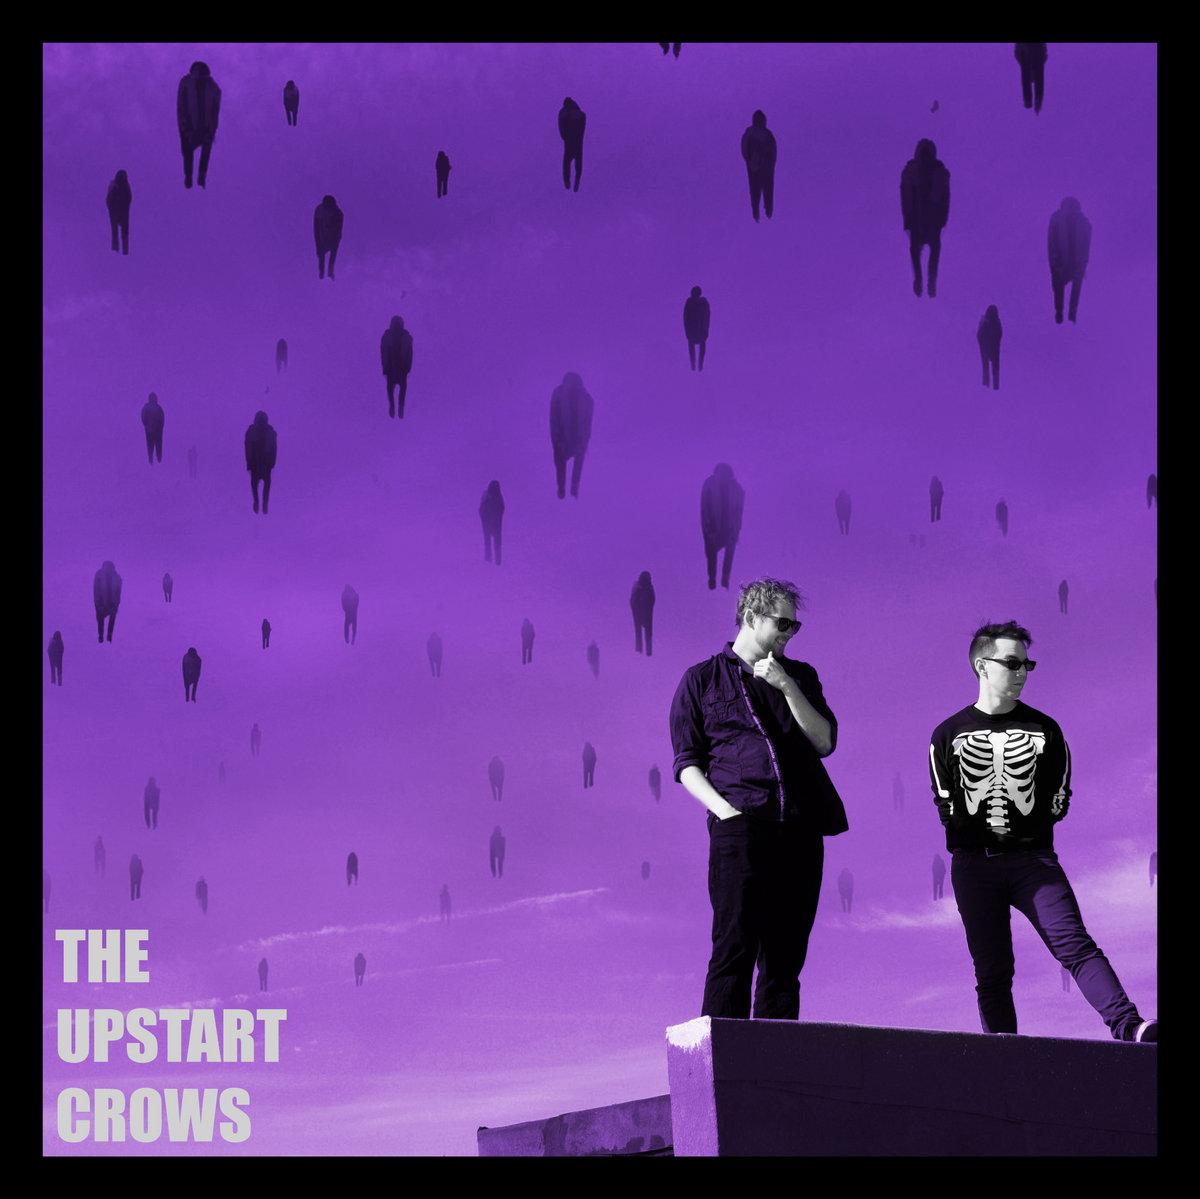 The Upstart Crows